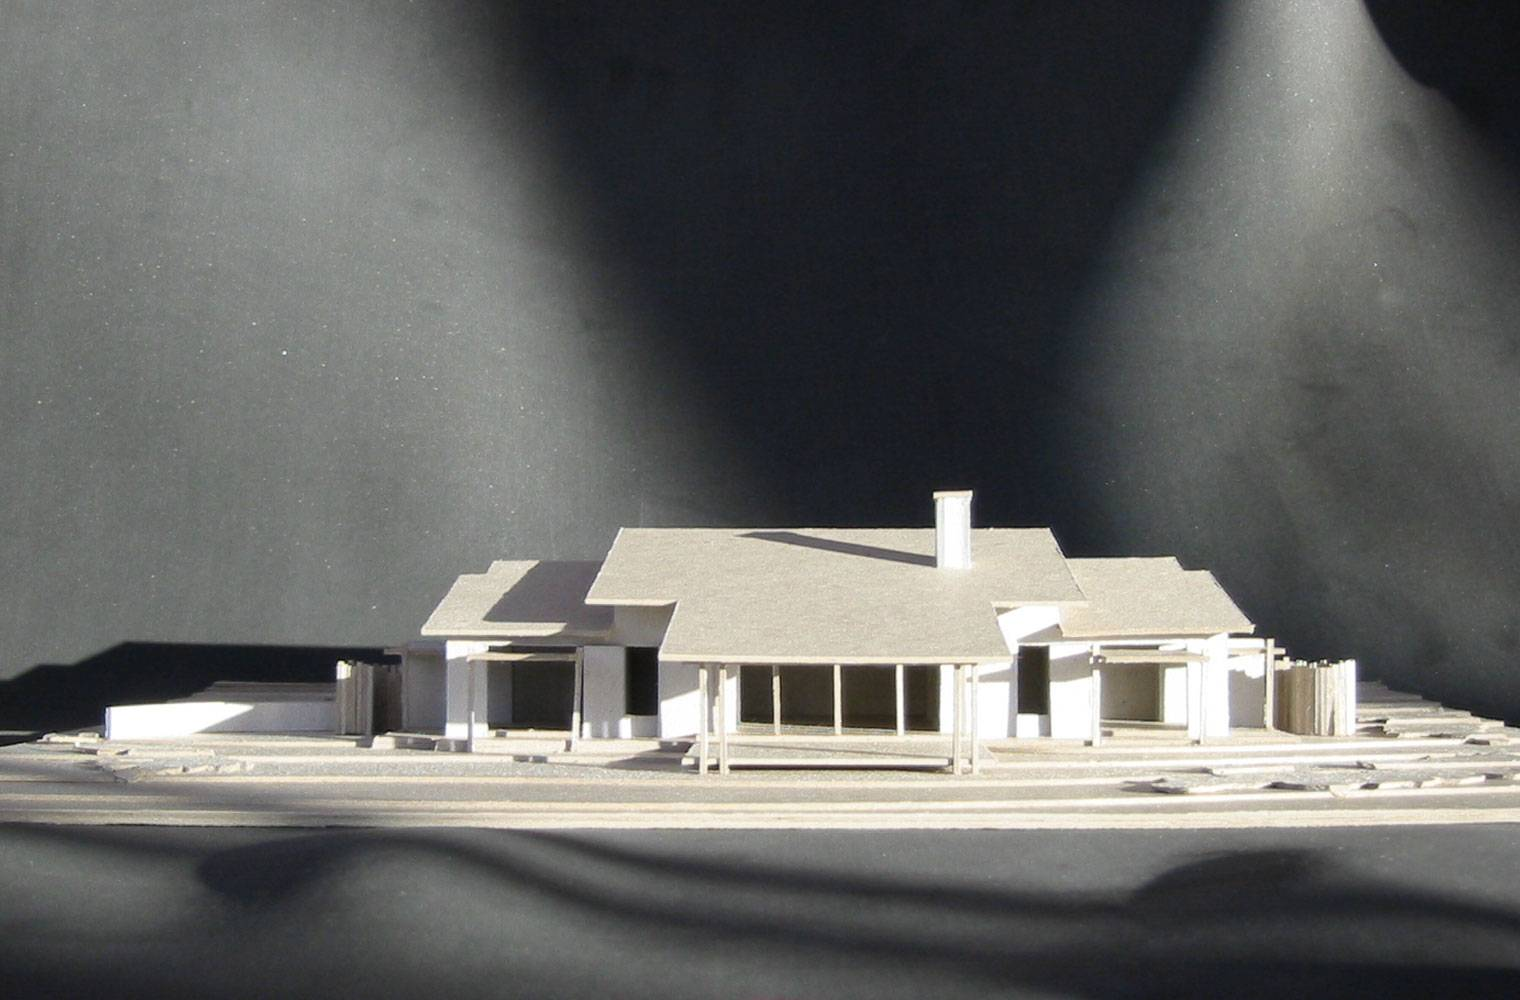 Breede River - Concept Model